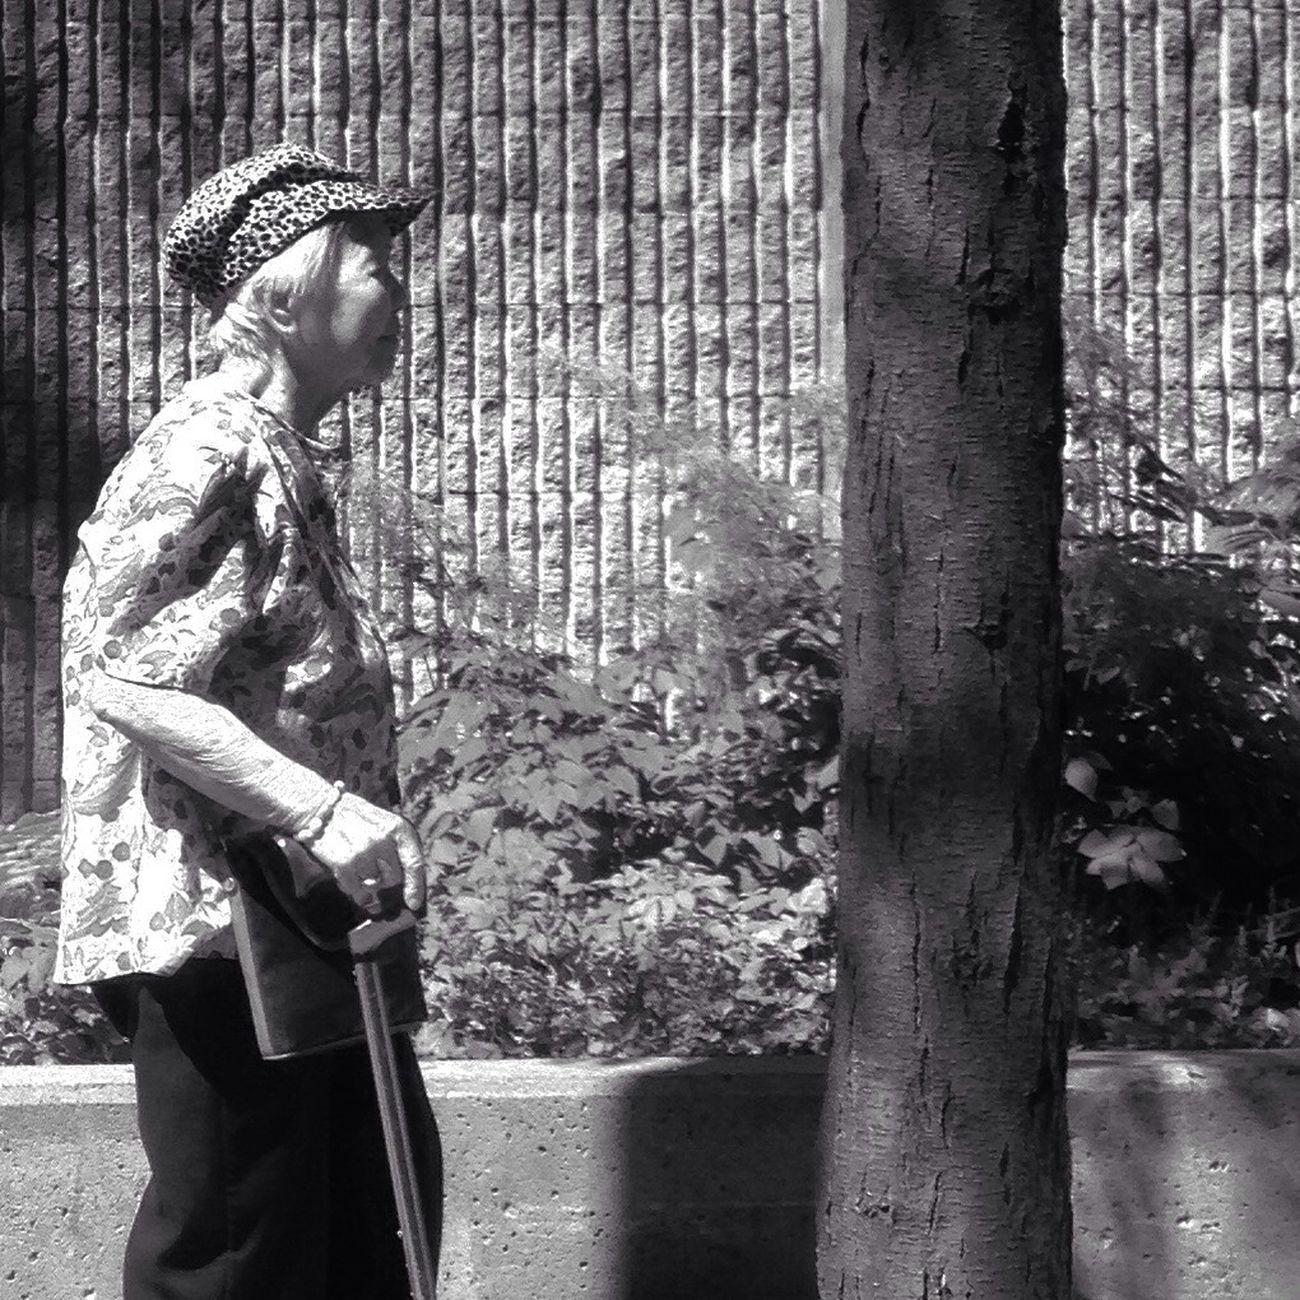 Blackandwhite Life In Motion Streetphotography Enjoying Life